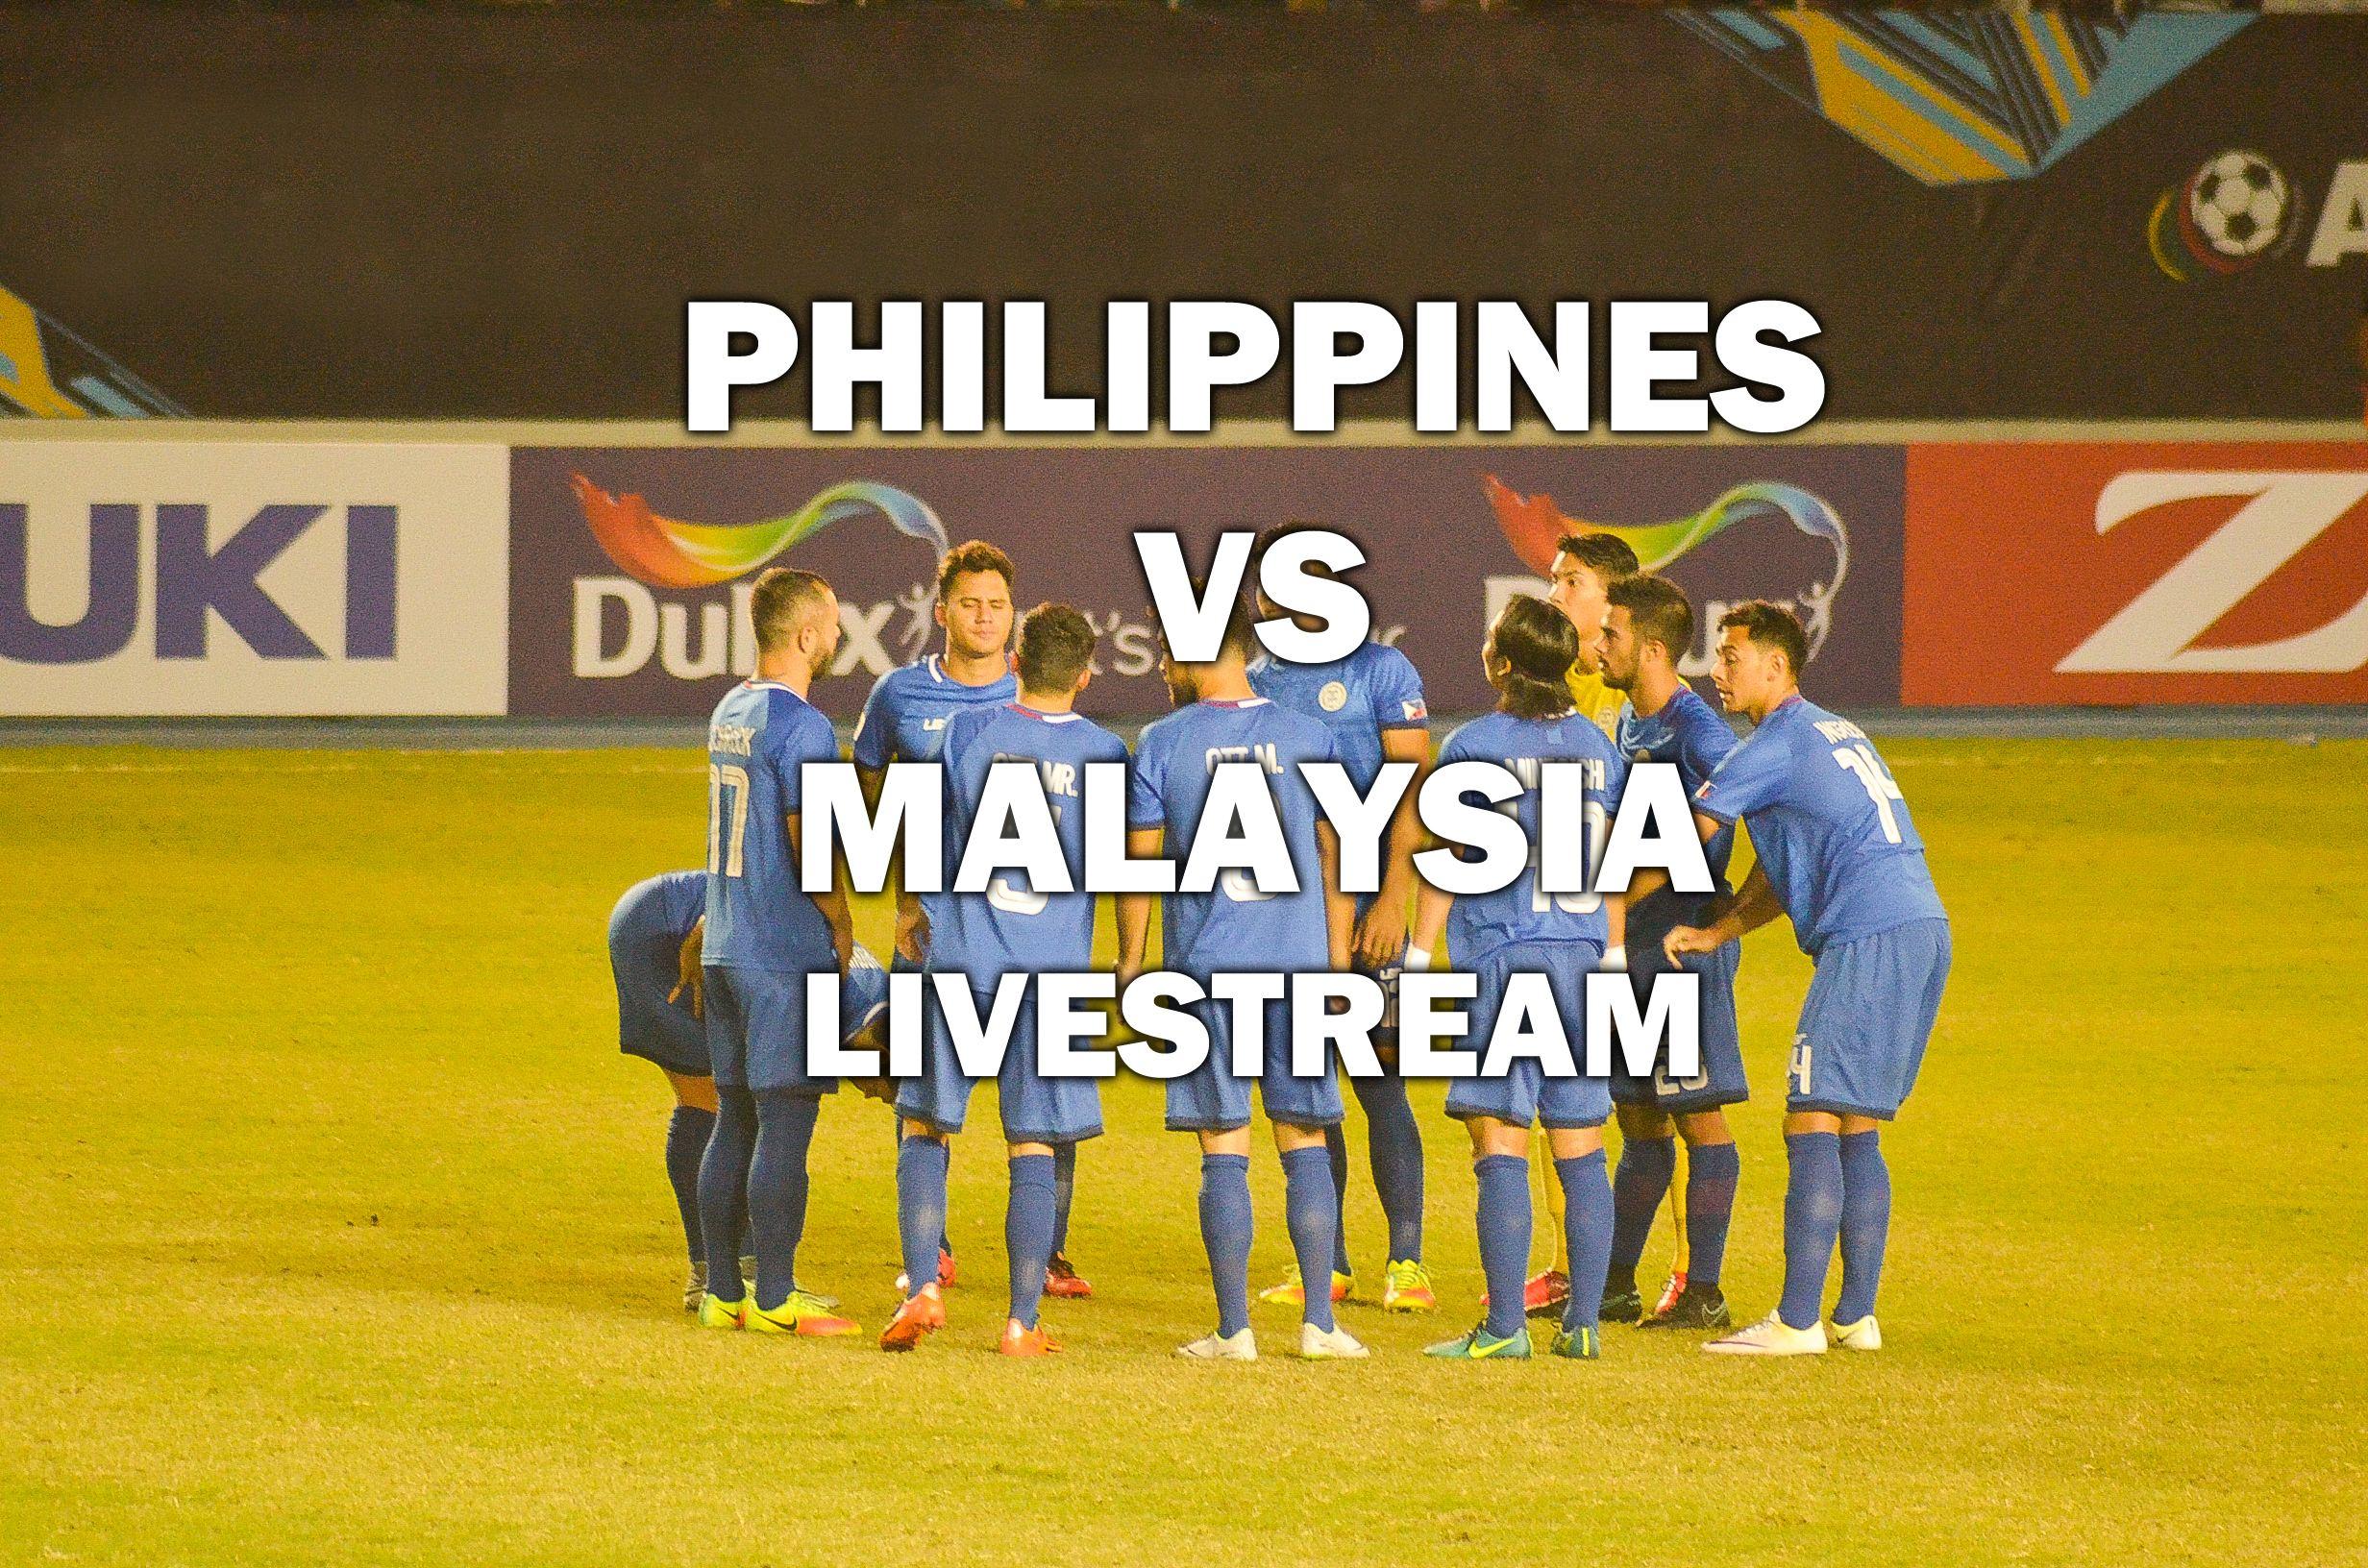 Philippines vs Malaysia livestream